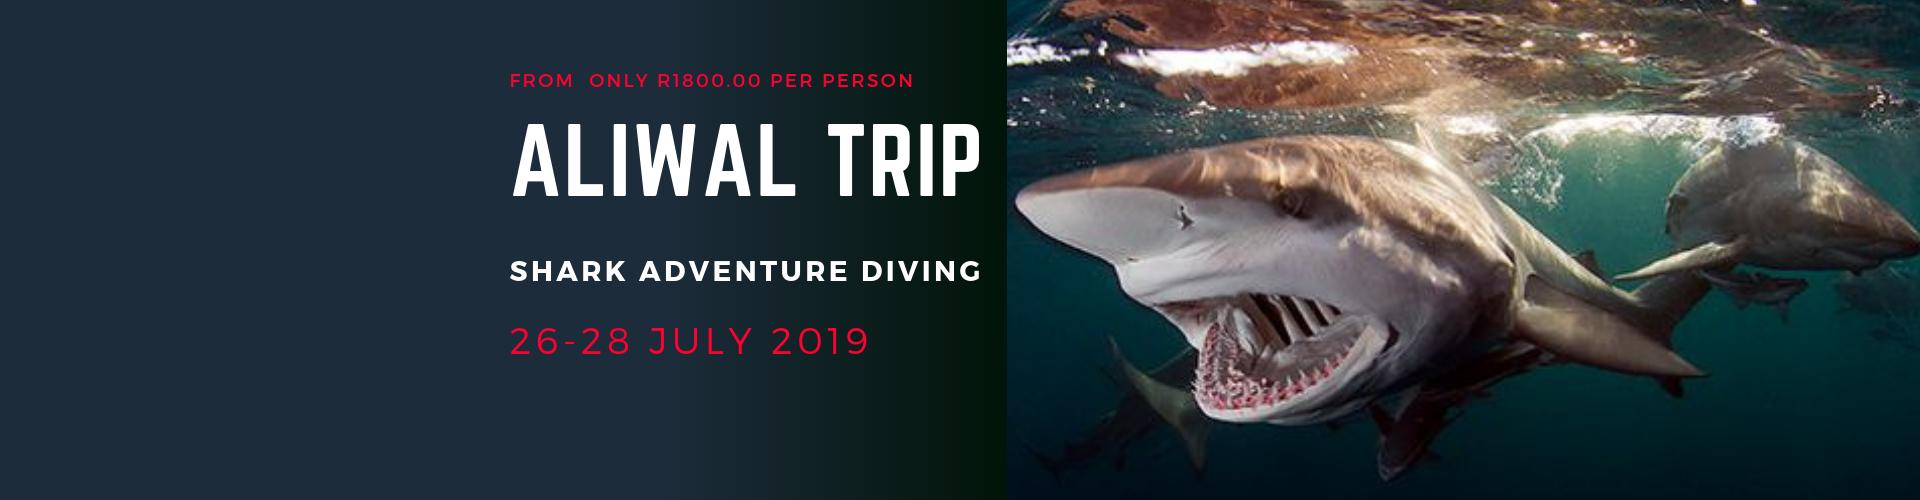 Aliwal Trip July 2019